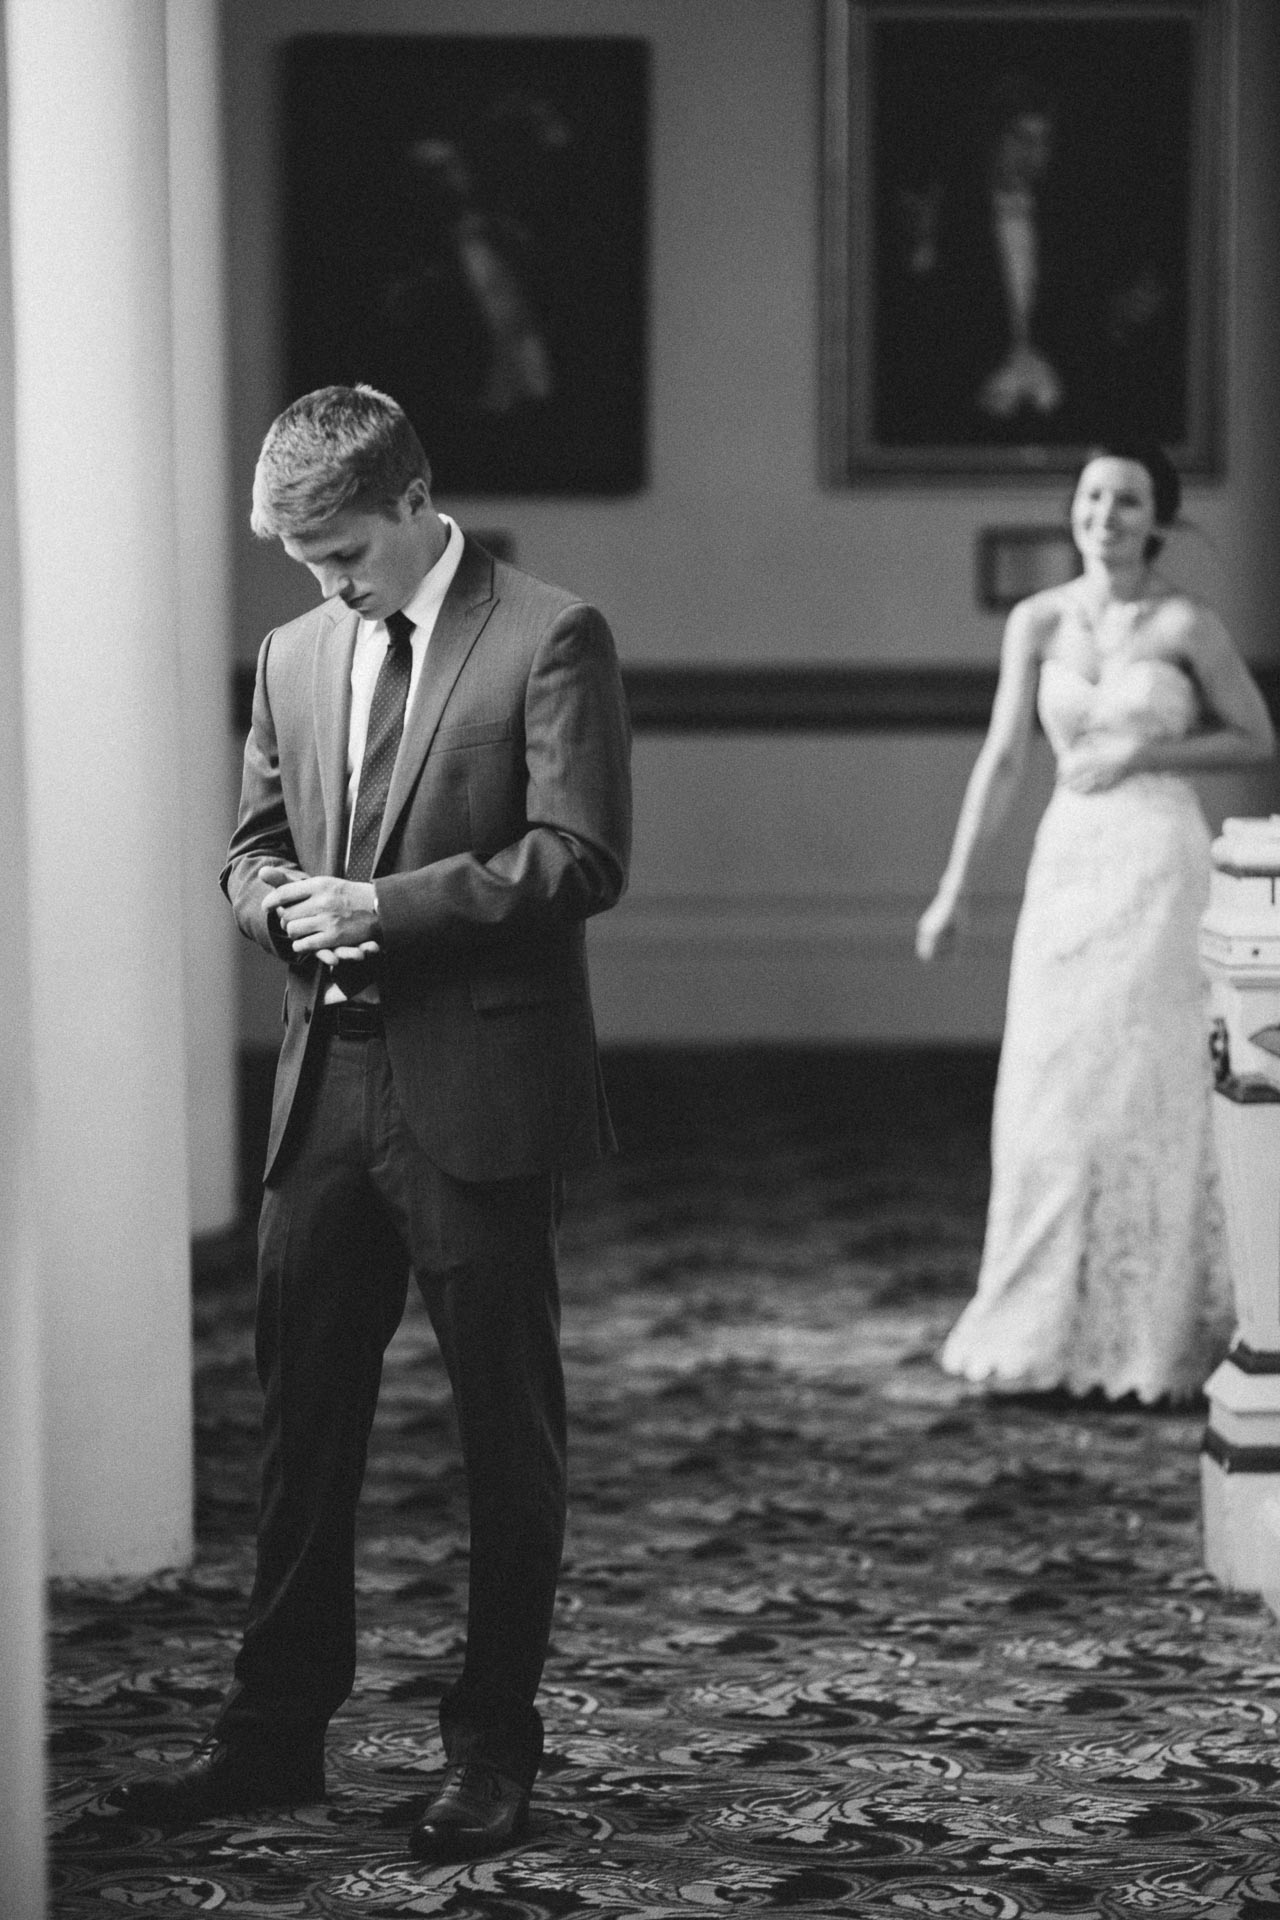 Julia-Michael-Cincinnati-Music-Hall-Wedding-042@2x.jpg